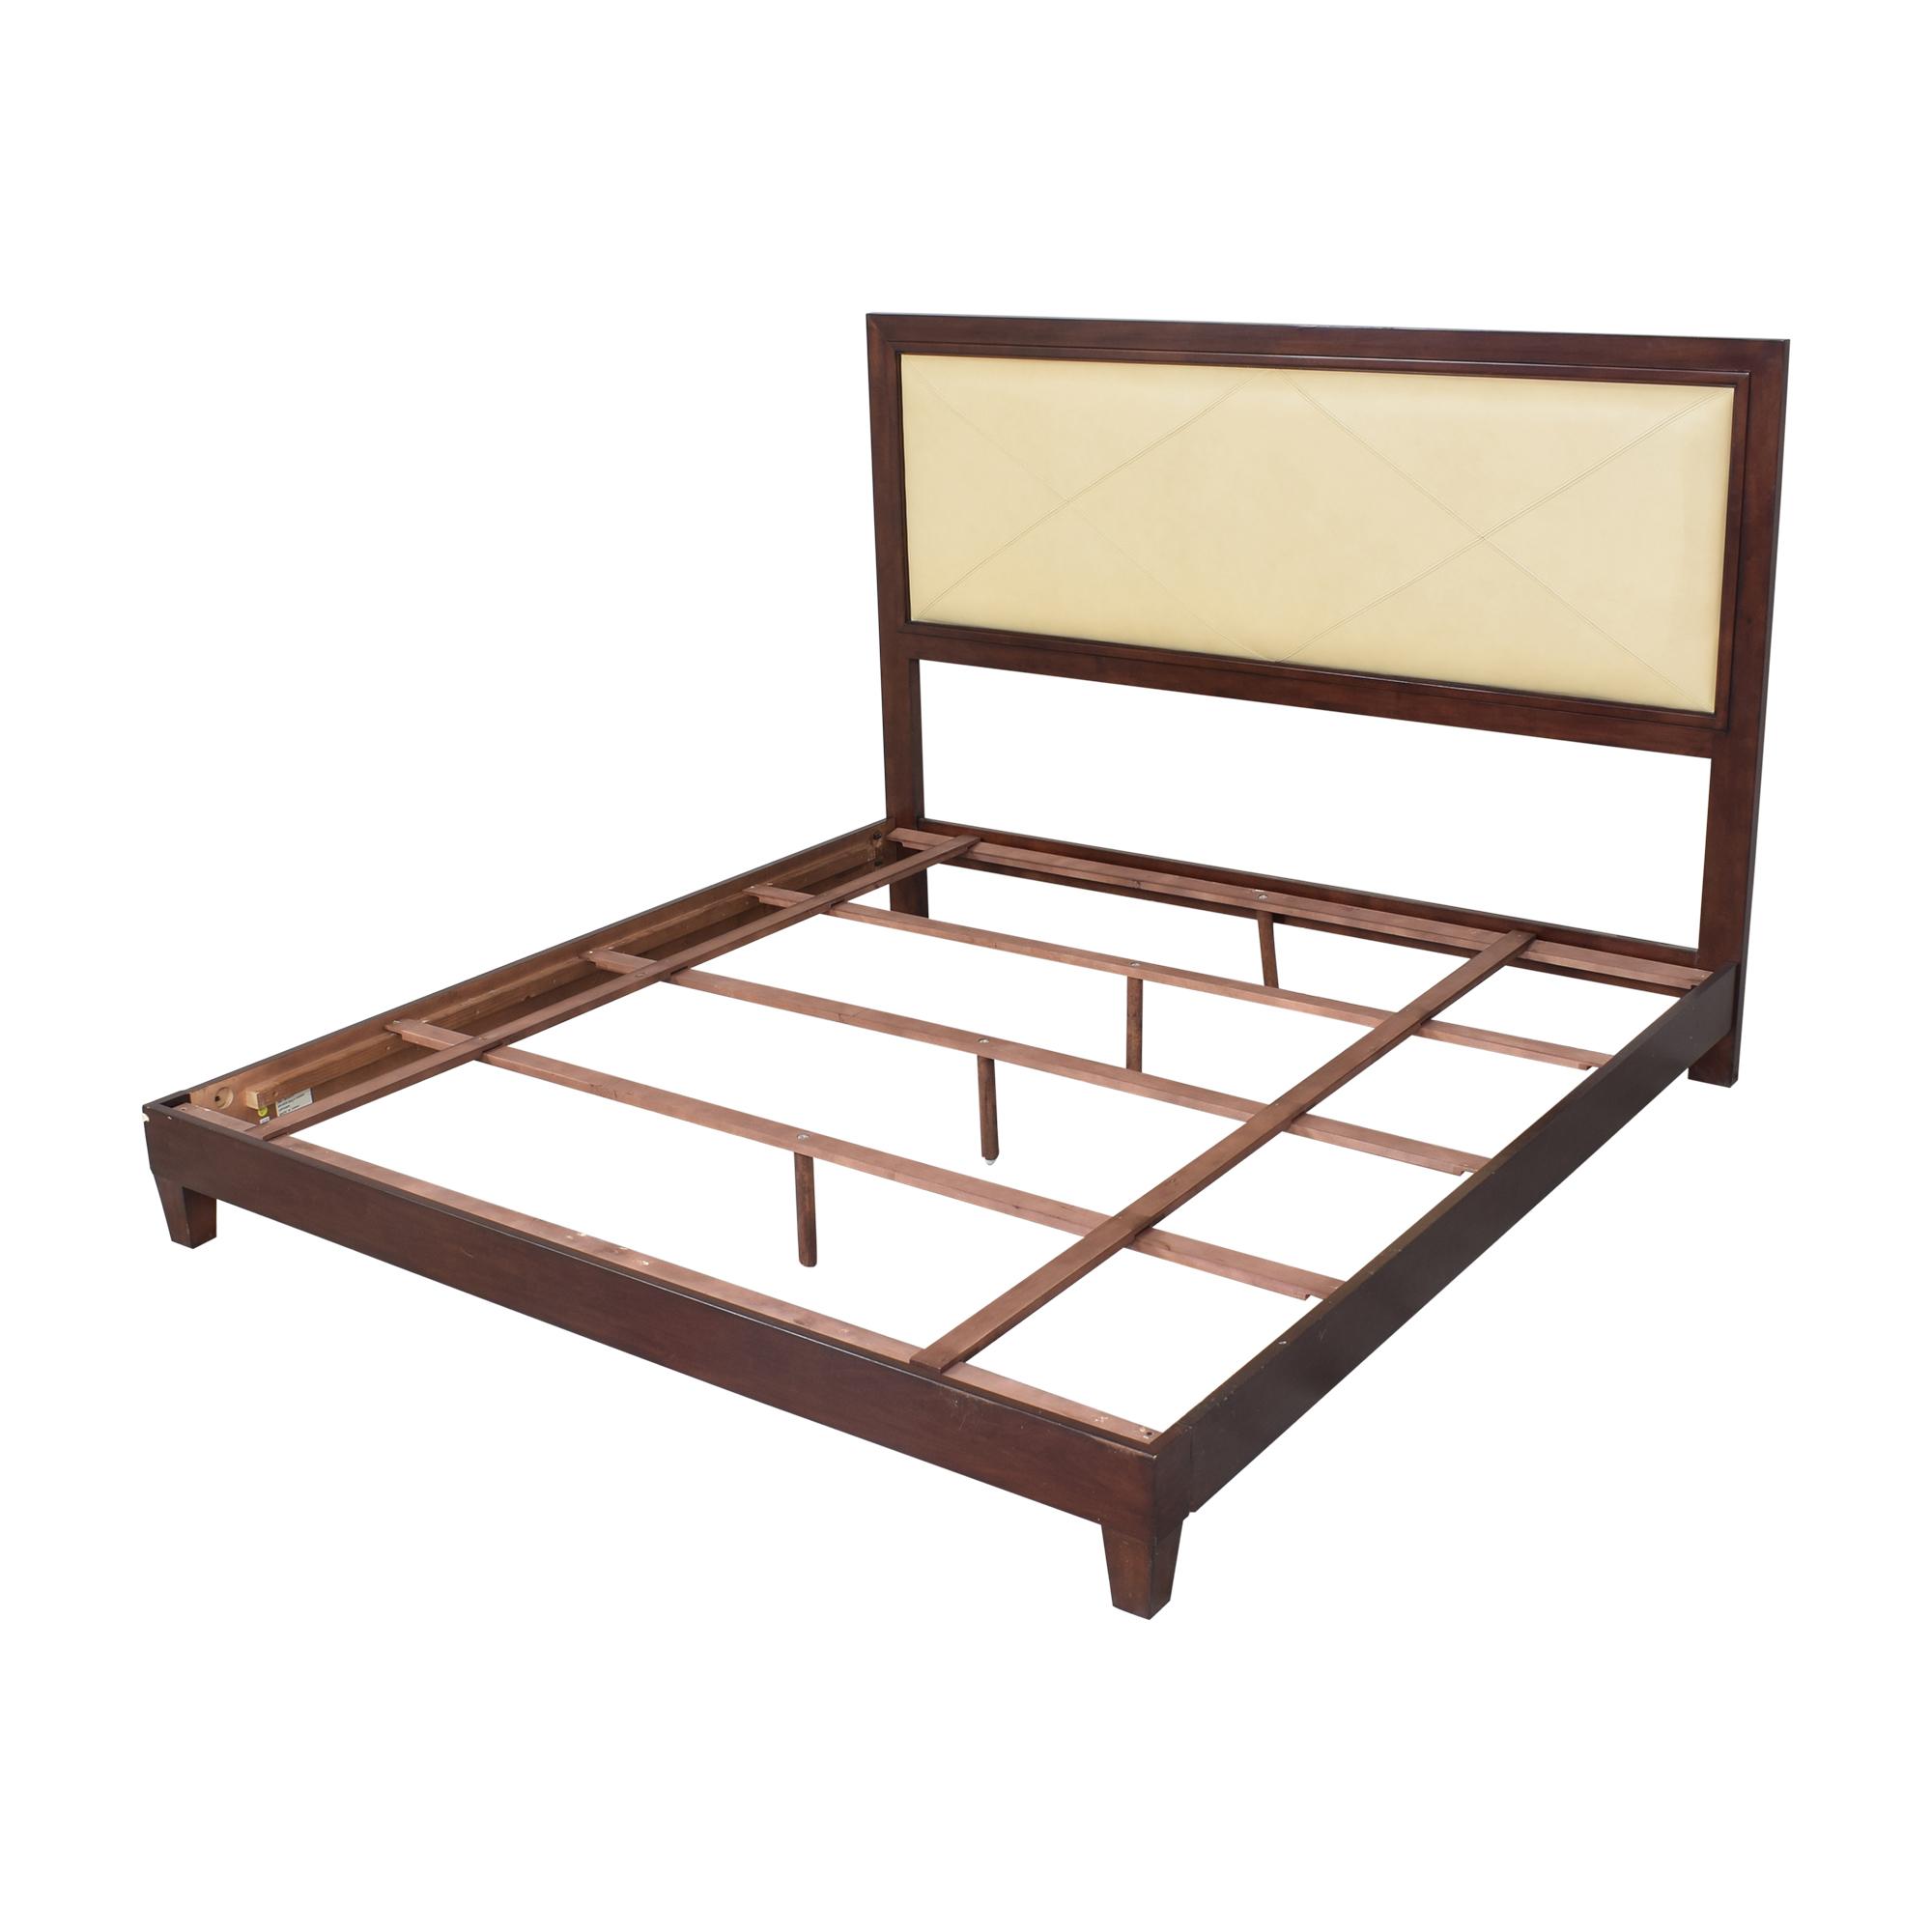 Drexel Heritage Drexel Heritage King Bed price